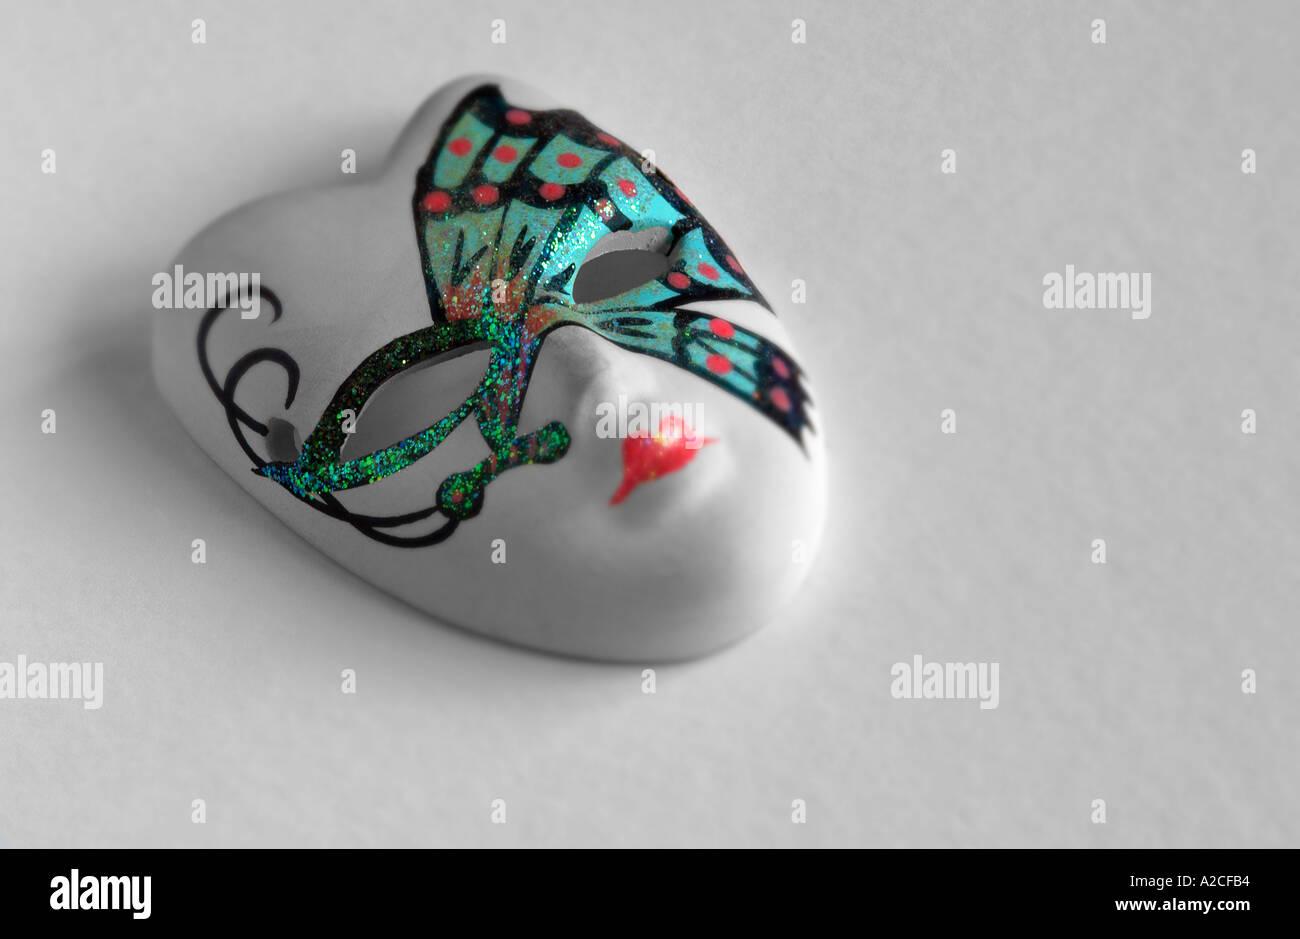 Mini Mask. - Stock Image